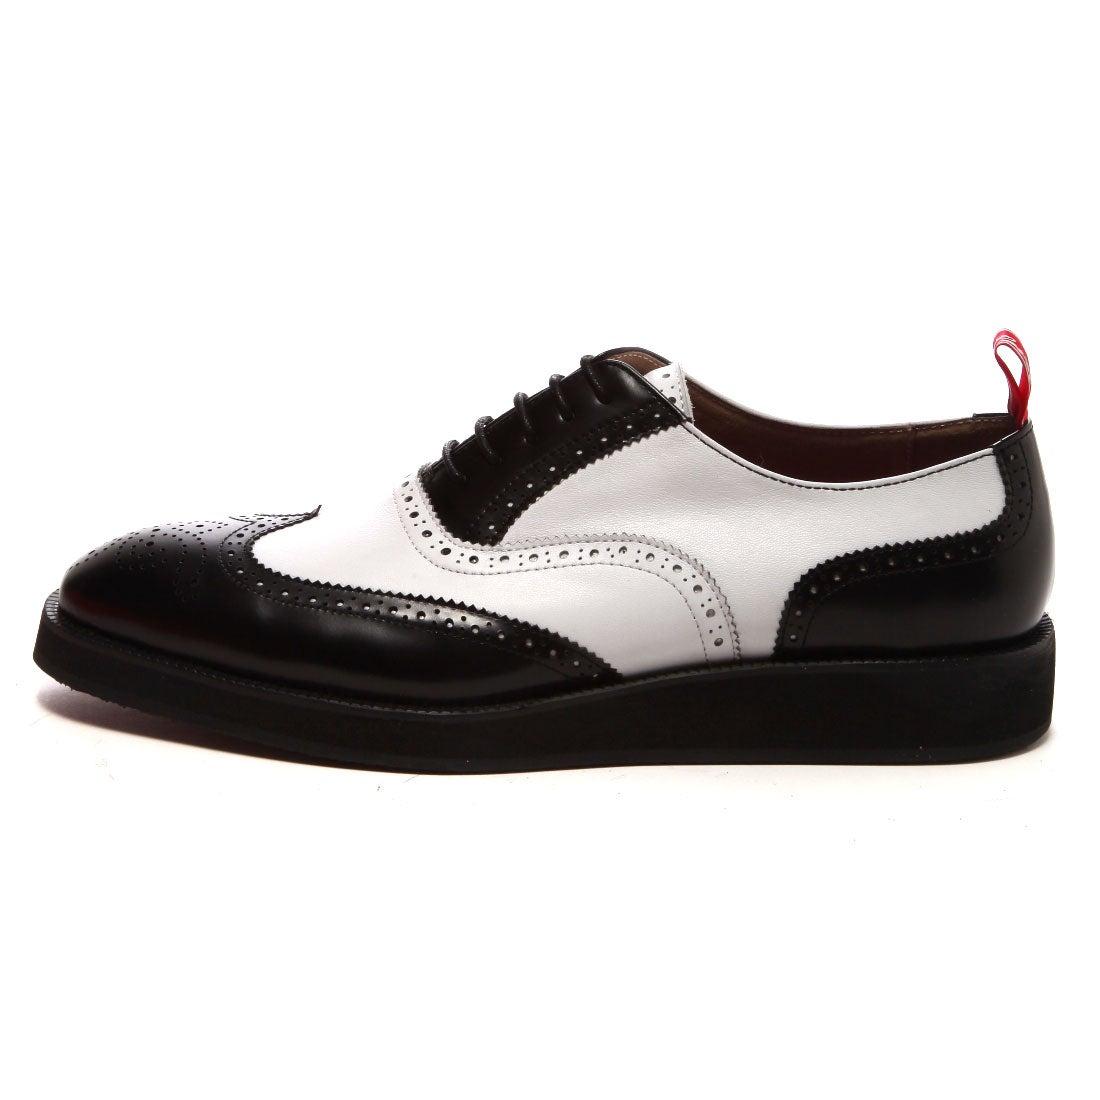 SFW レッド カバー RED COVER 厚底白黒コンビシューズ(ブラックホワイト) ,靴とファッションの通販サイト ロコンド